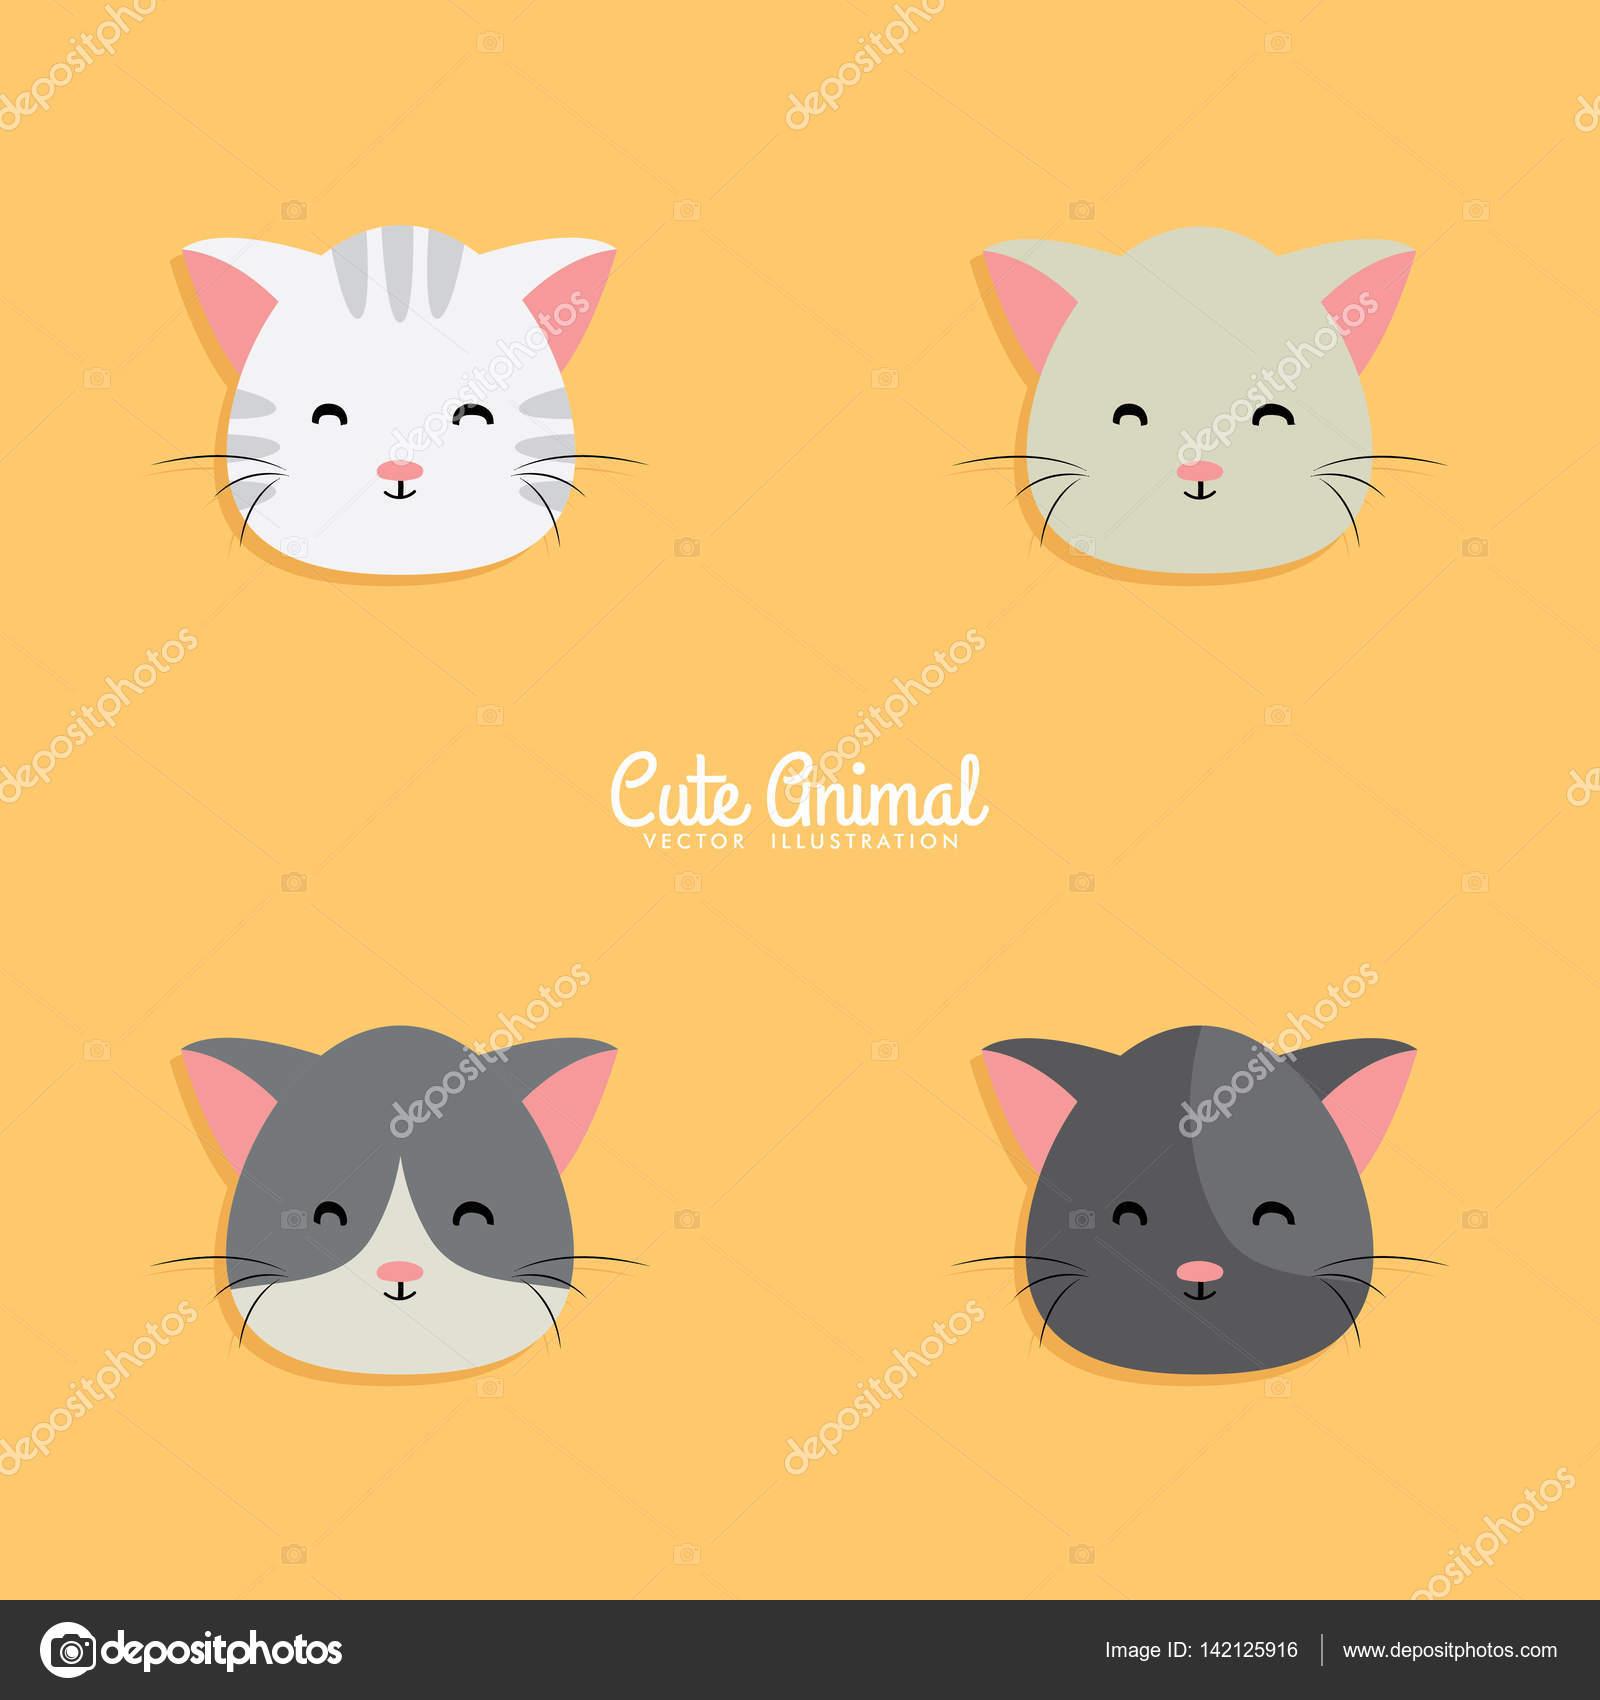 Imágenes Caras De Gatos Animados Caras De Dibujos Animados De